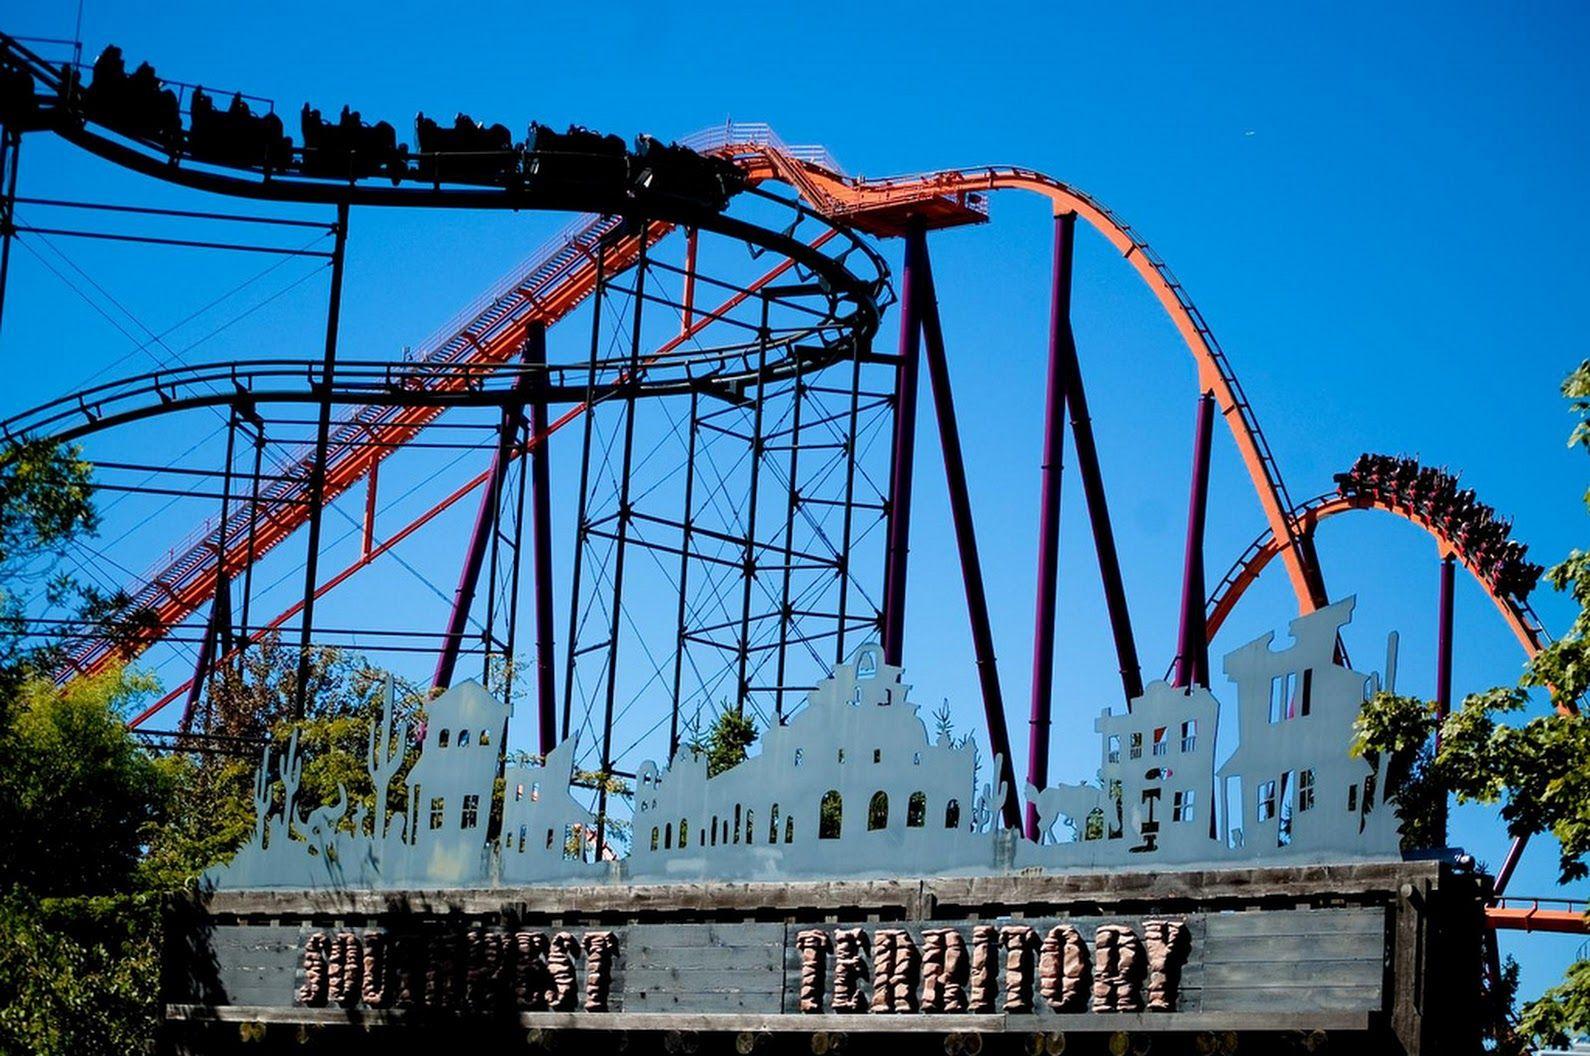 Sign In Amusement Park Rides Great America Amusement Park